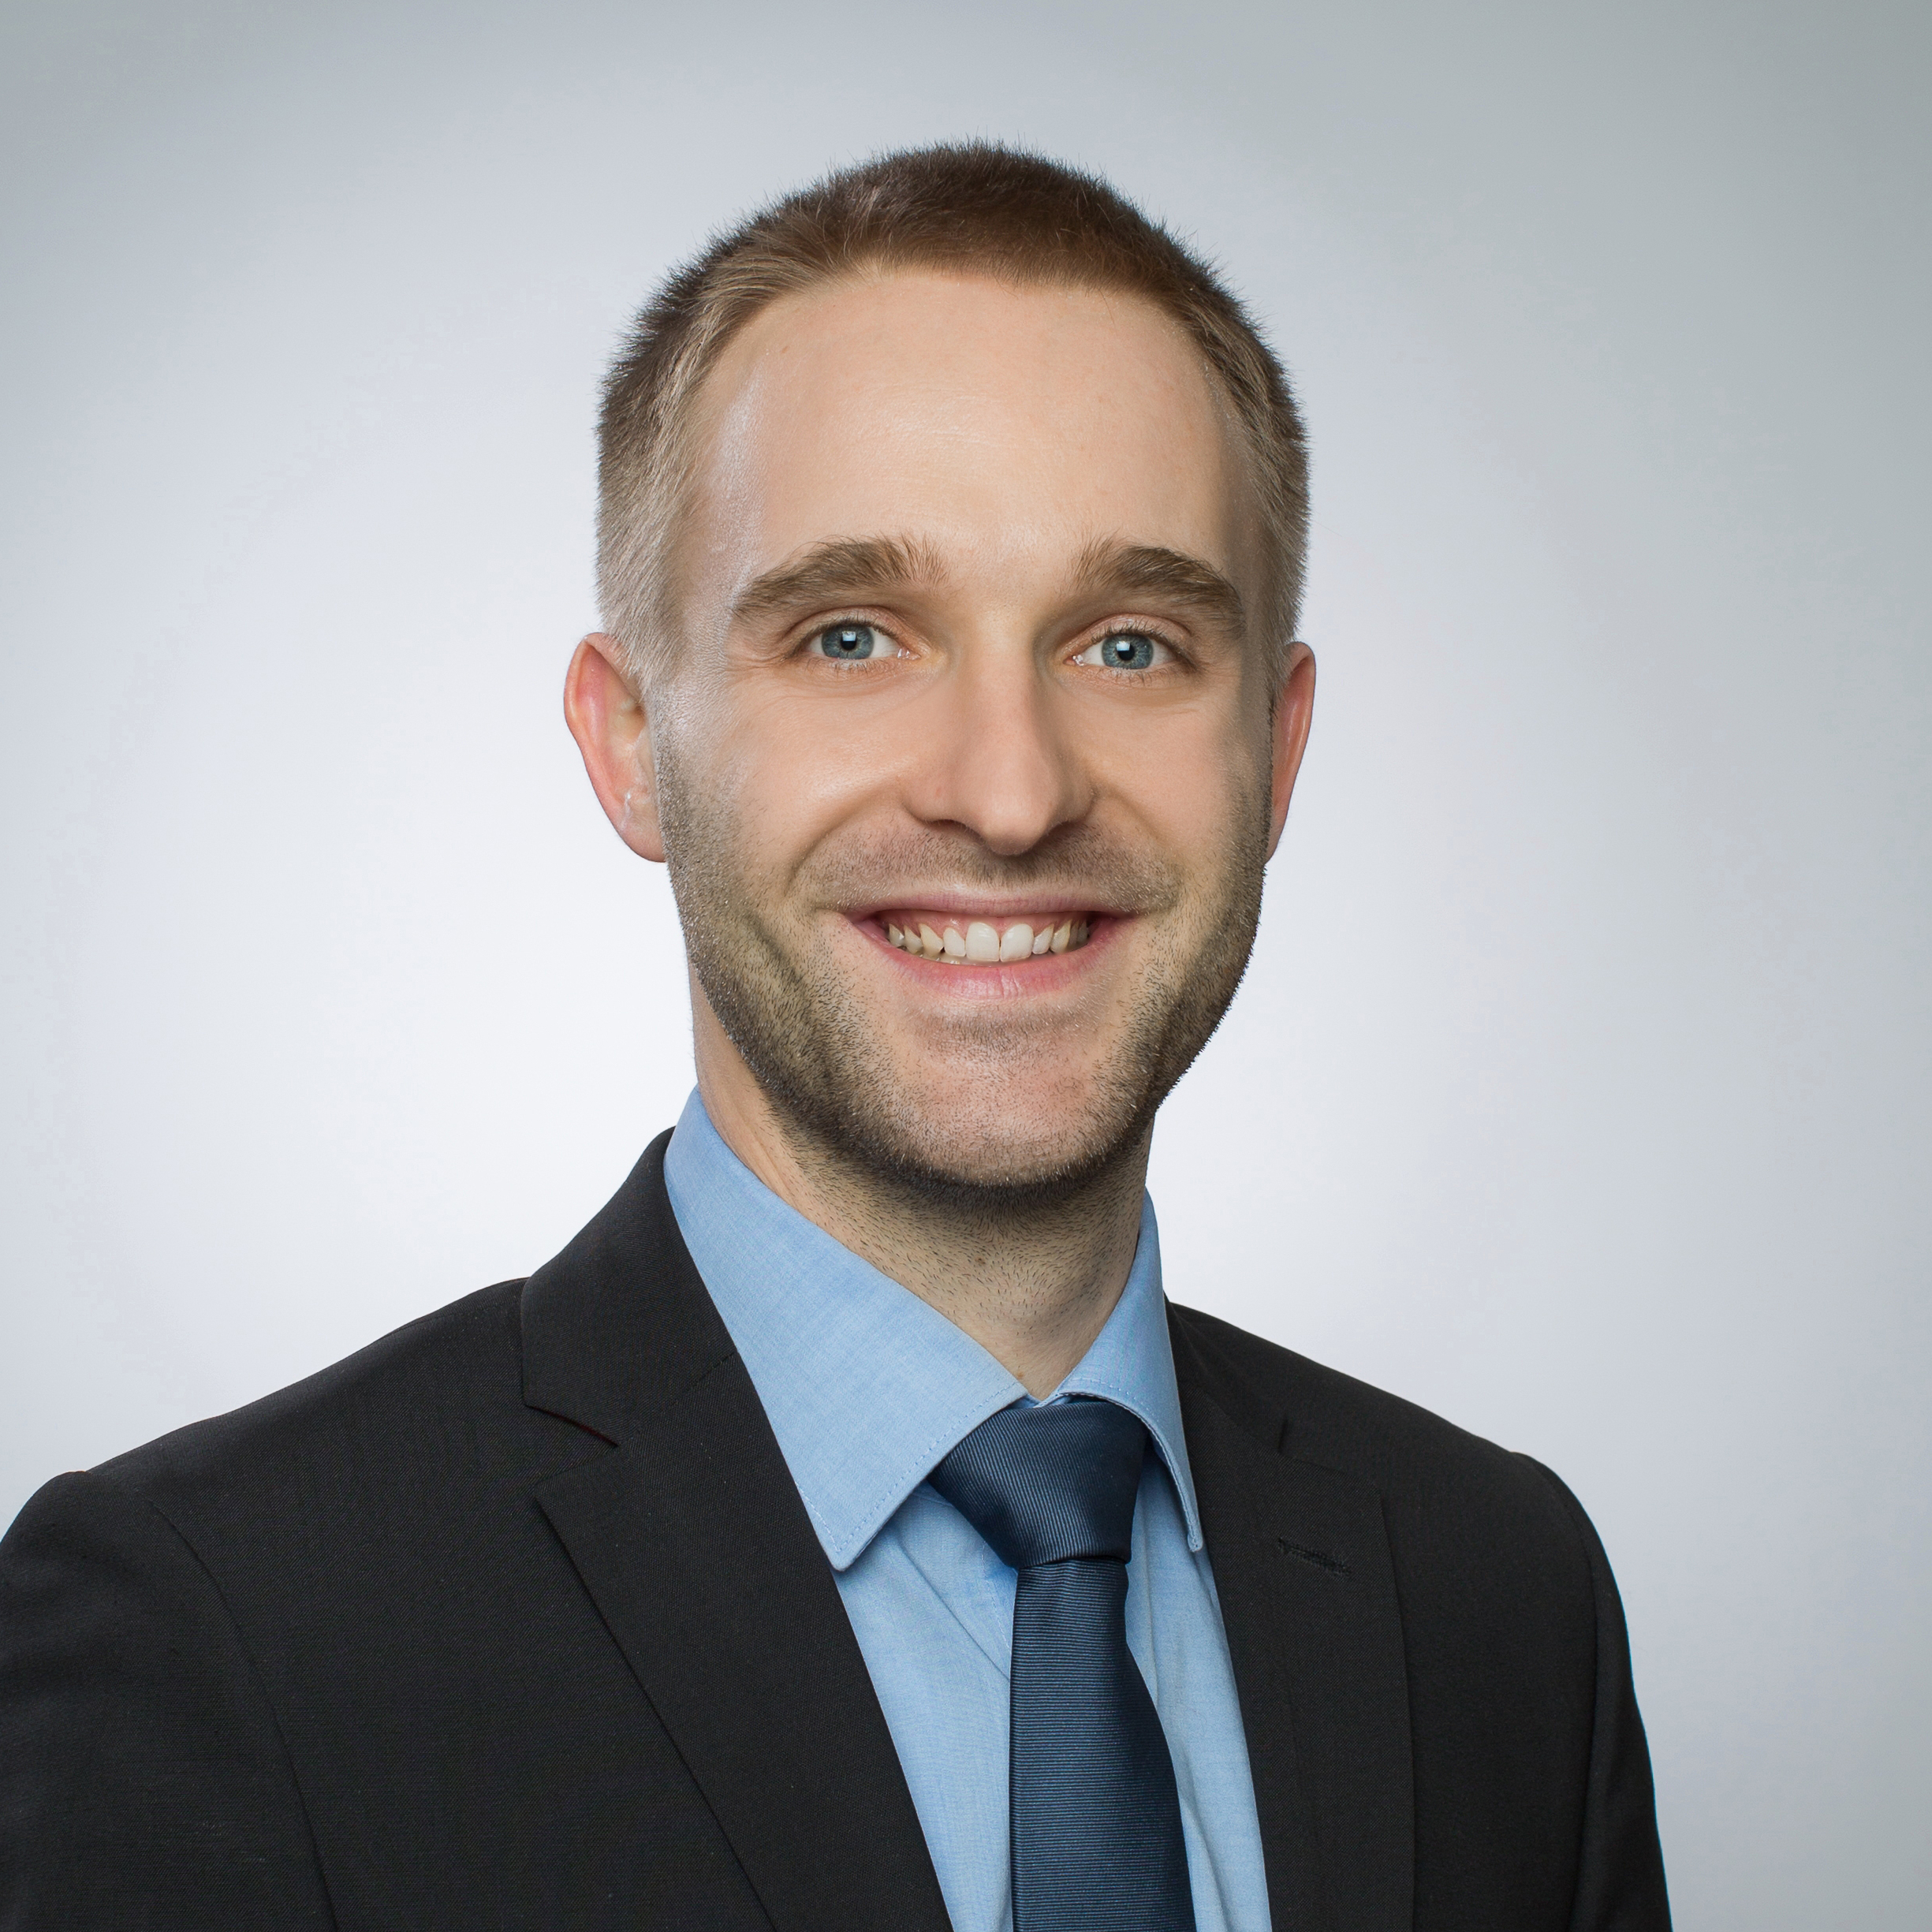 Daniel Enzensperger